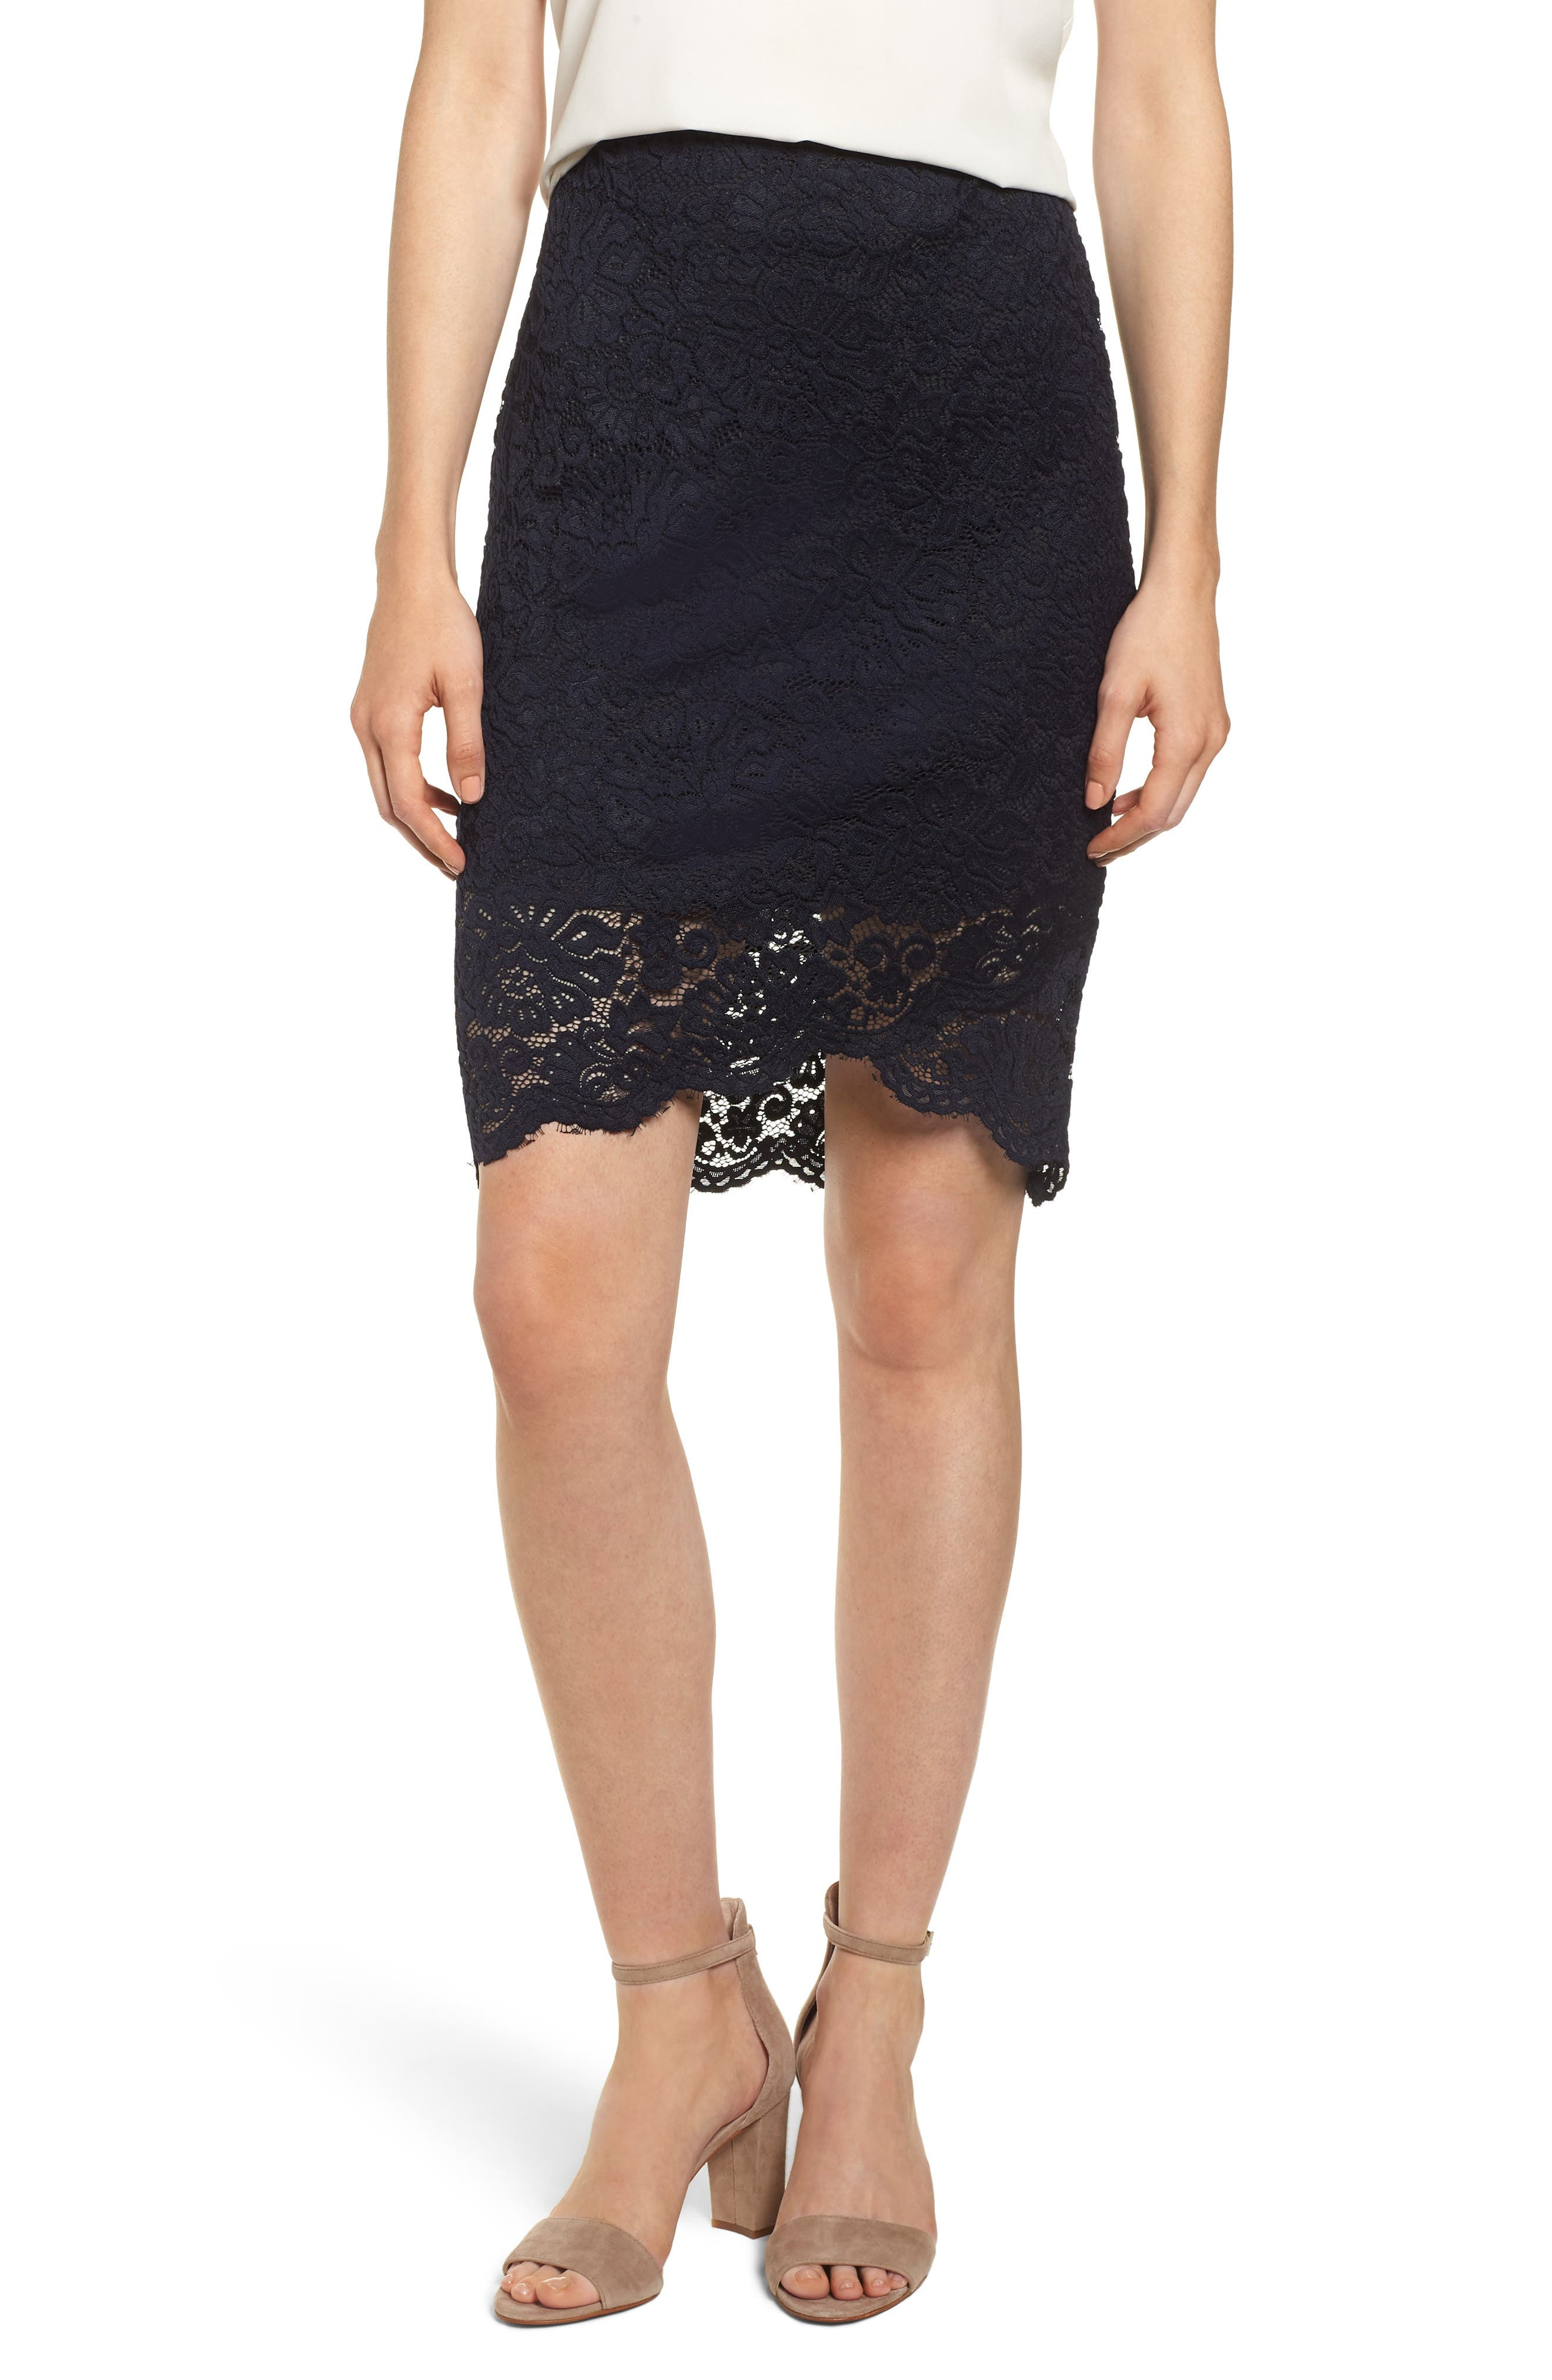 ROSEMUNDE, Lace Pencil Skirt, Main thumbnail 1, color, 001